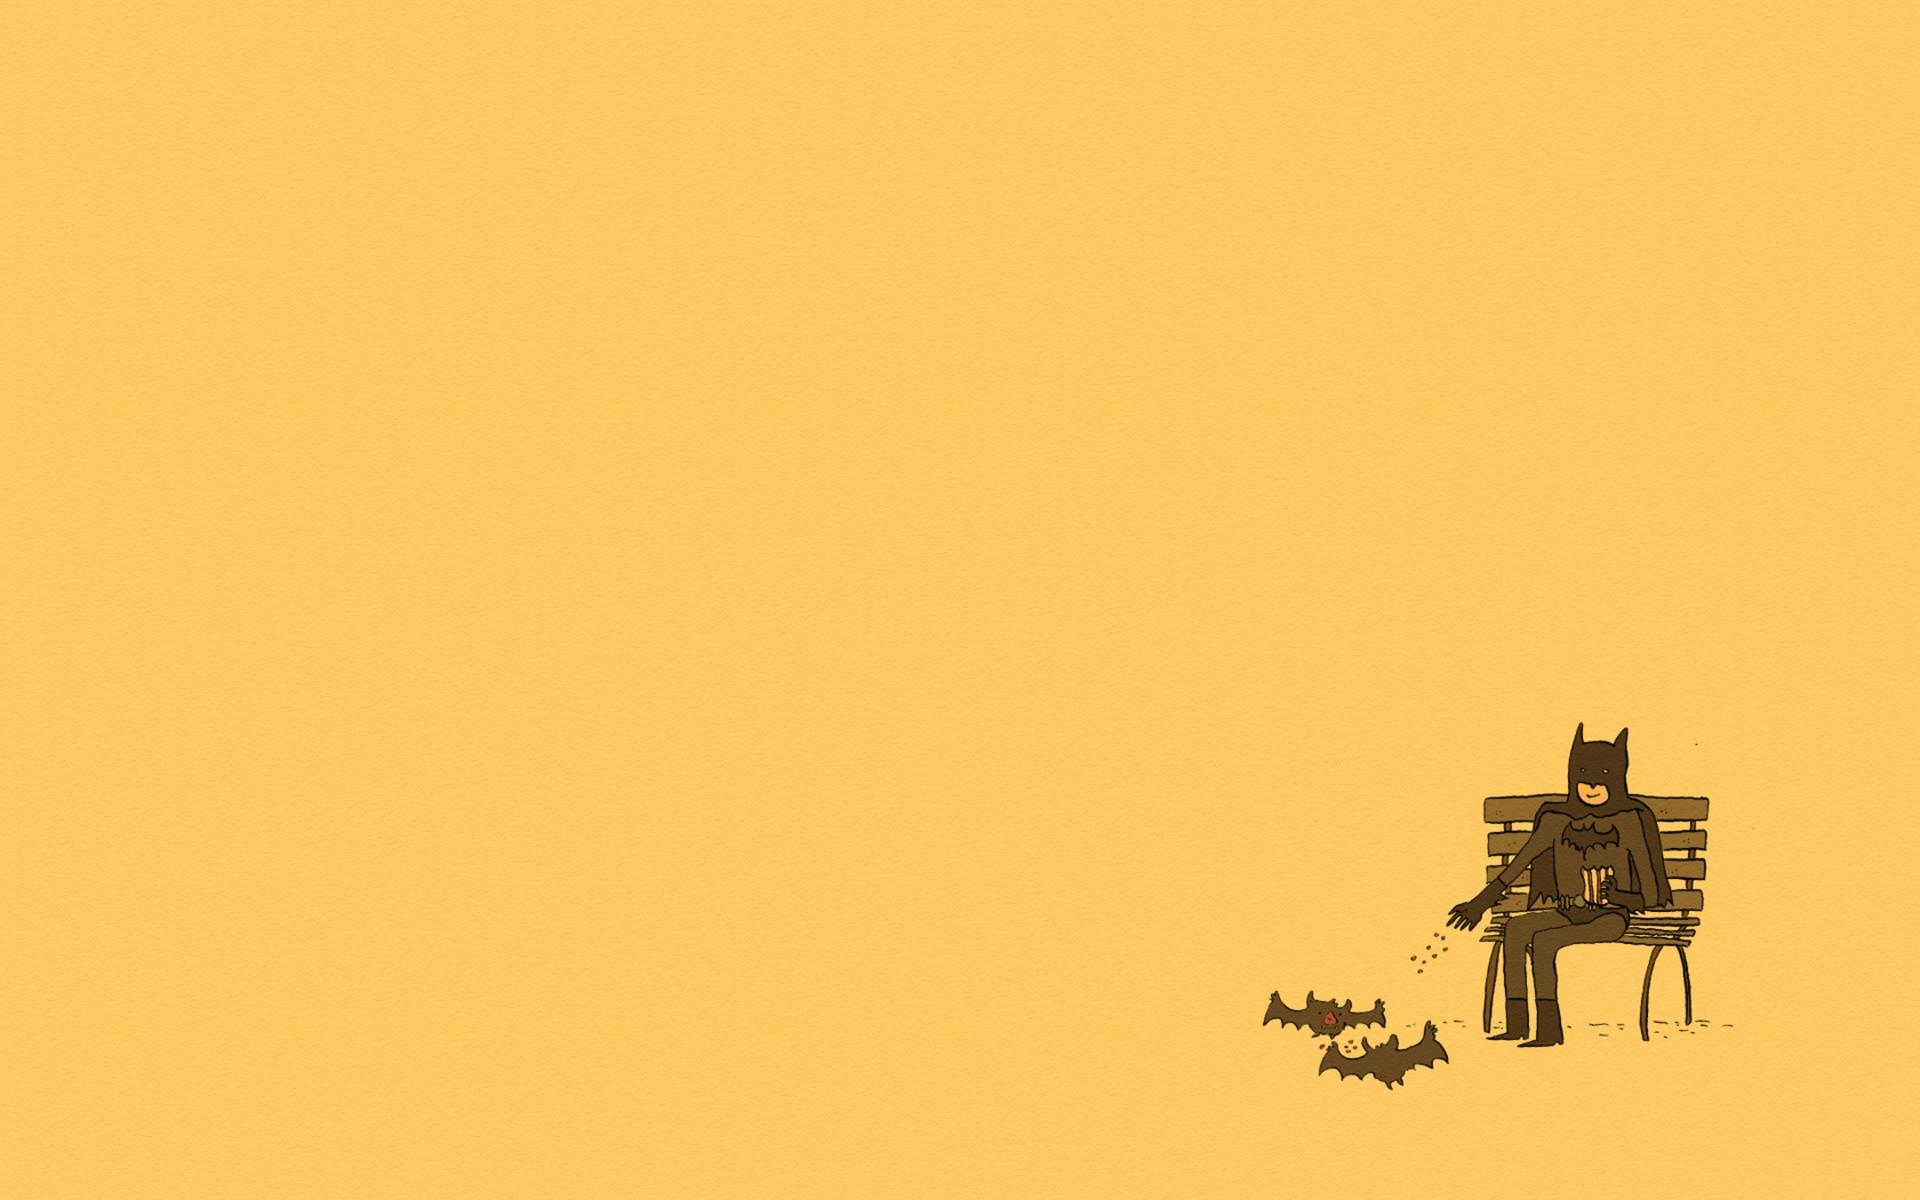 illustration minimalism sky Batman yellow morning comics screenshot computer wallpaper font 636903